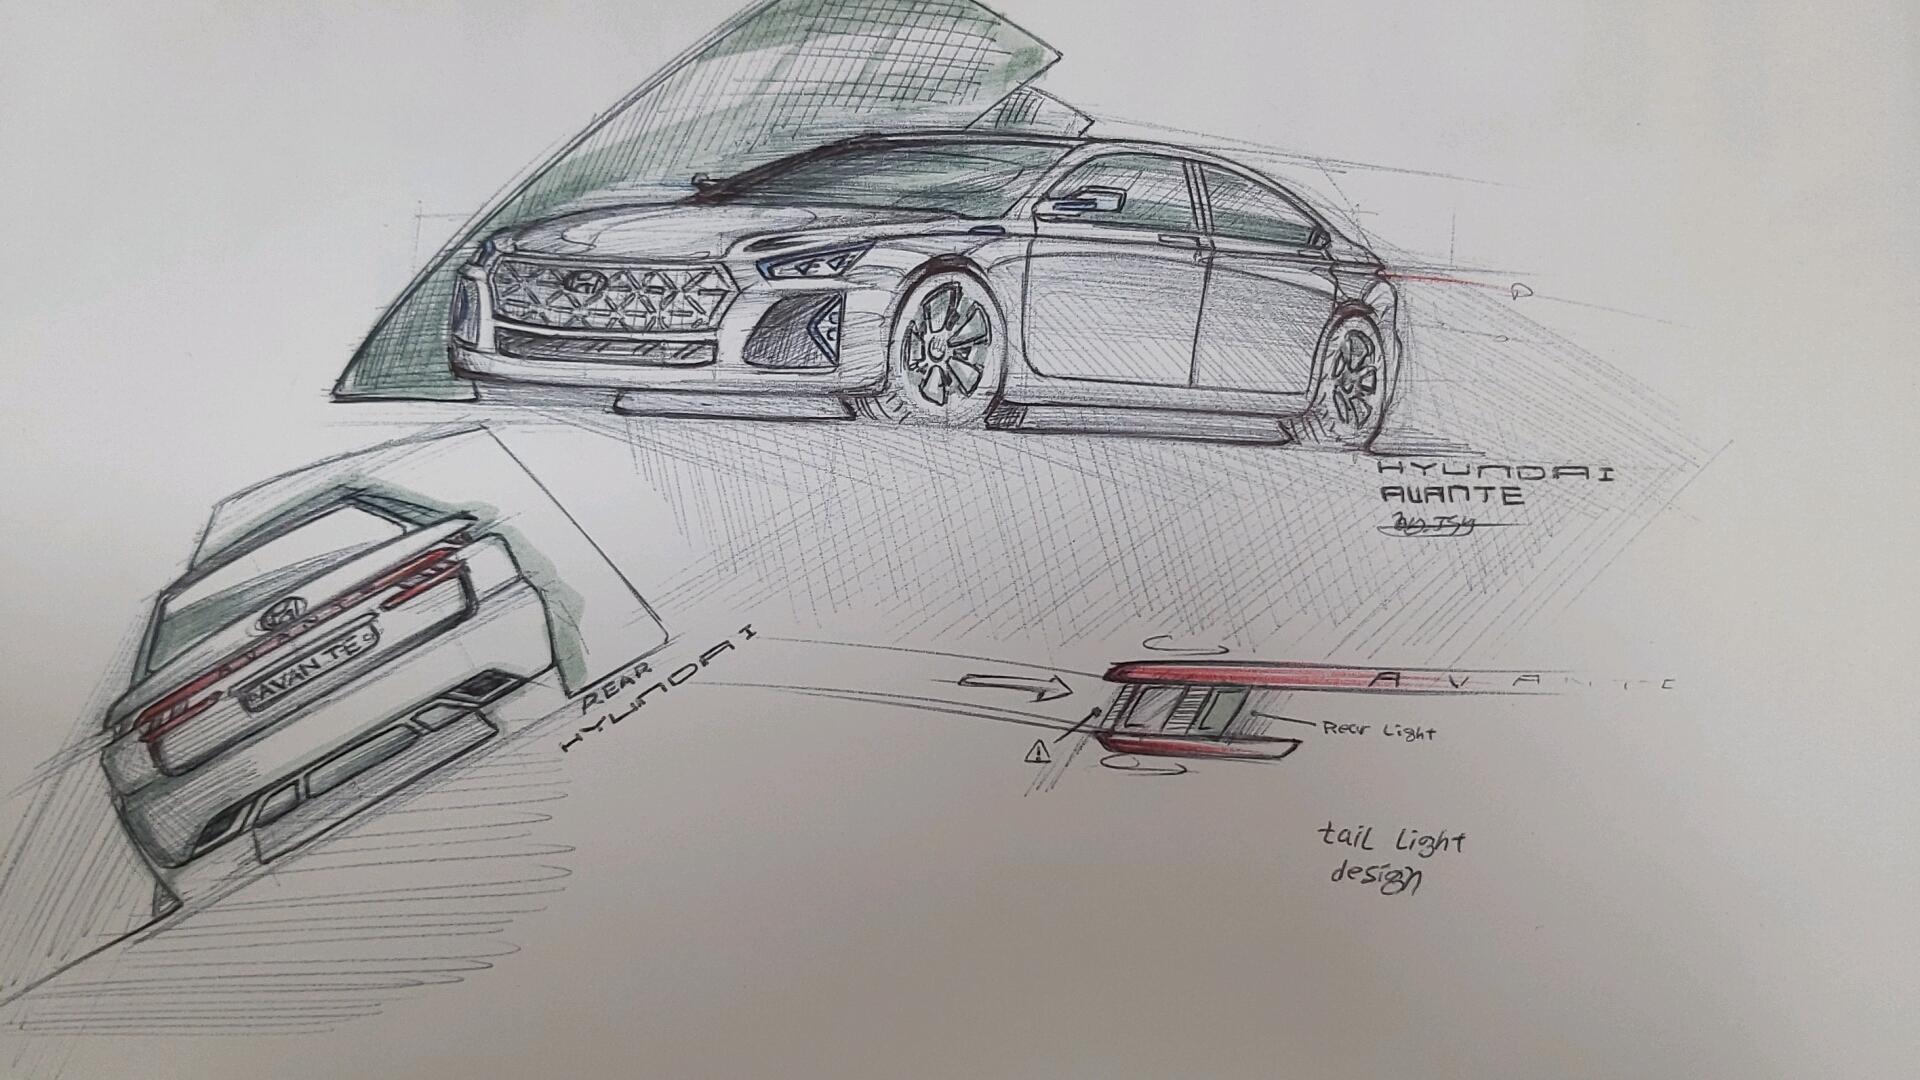 Hyundai Avante Re-design (2)